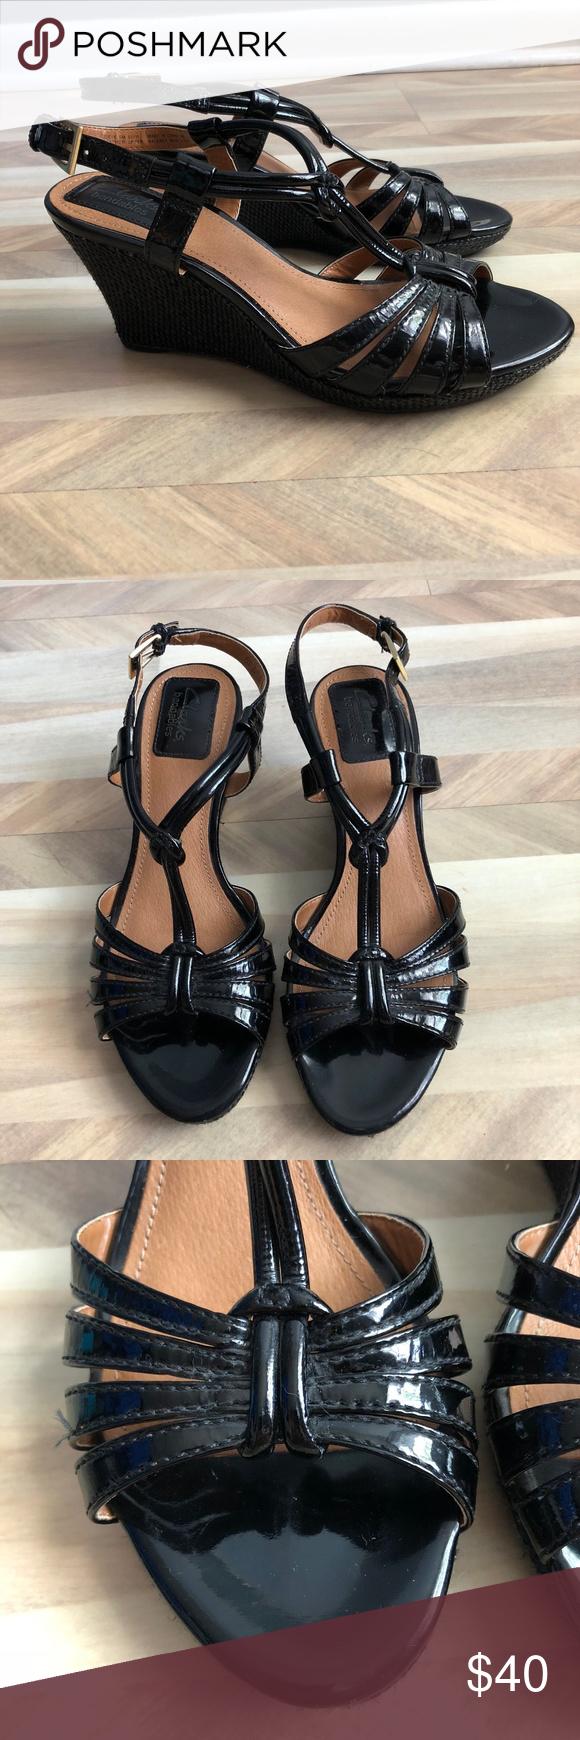 Clarks Bendables Patent Leather Sandal